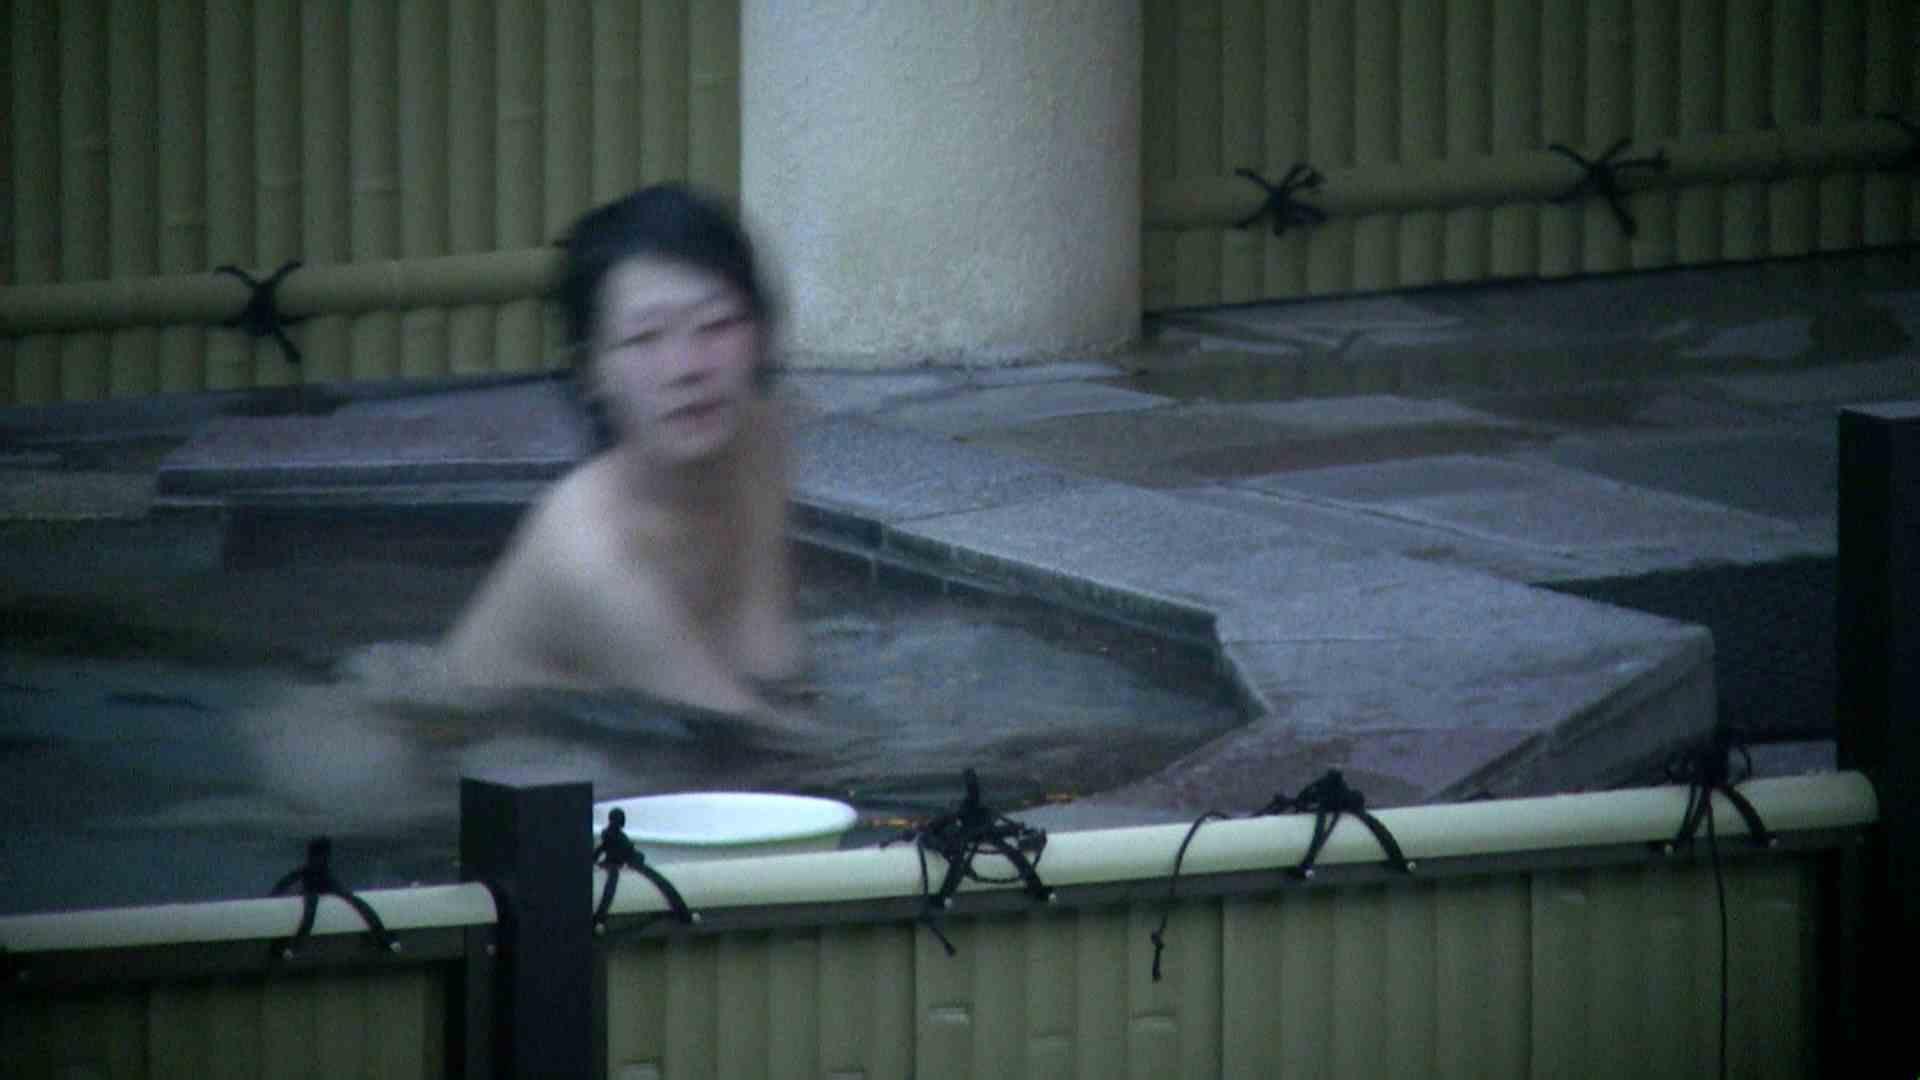 Aquaな露天風呂Vol.05【VIP】 露天風呂編  112PIX 18